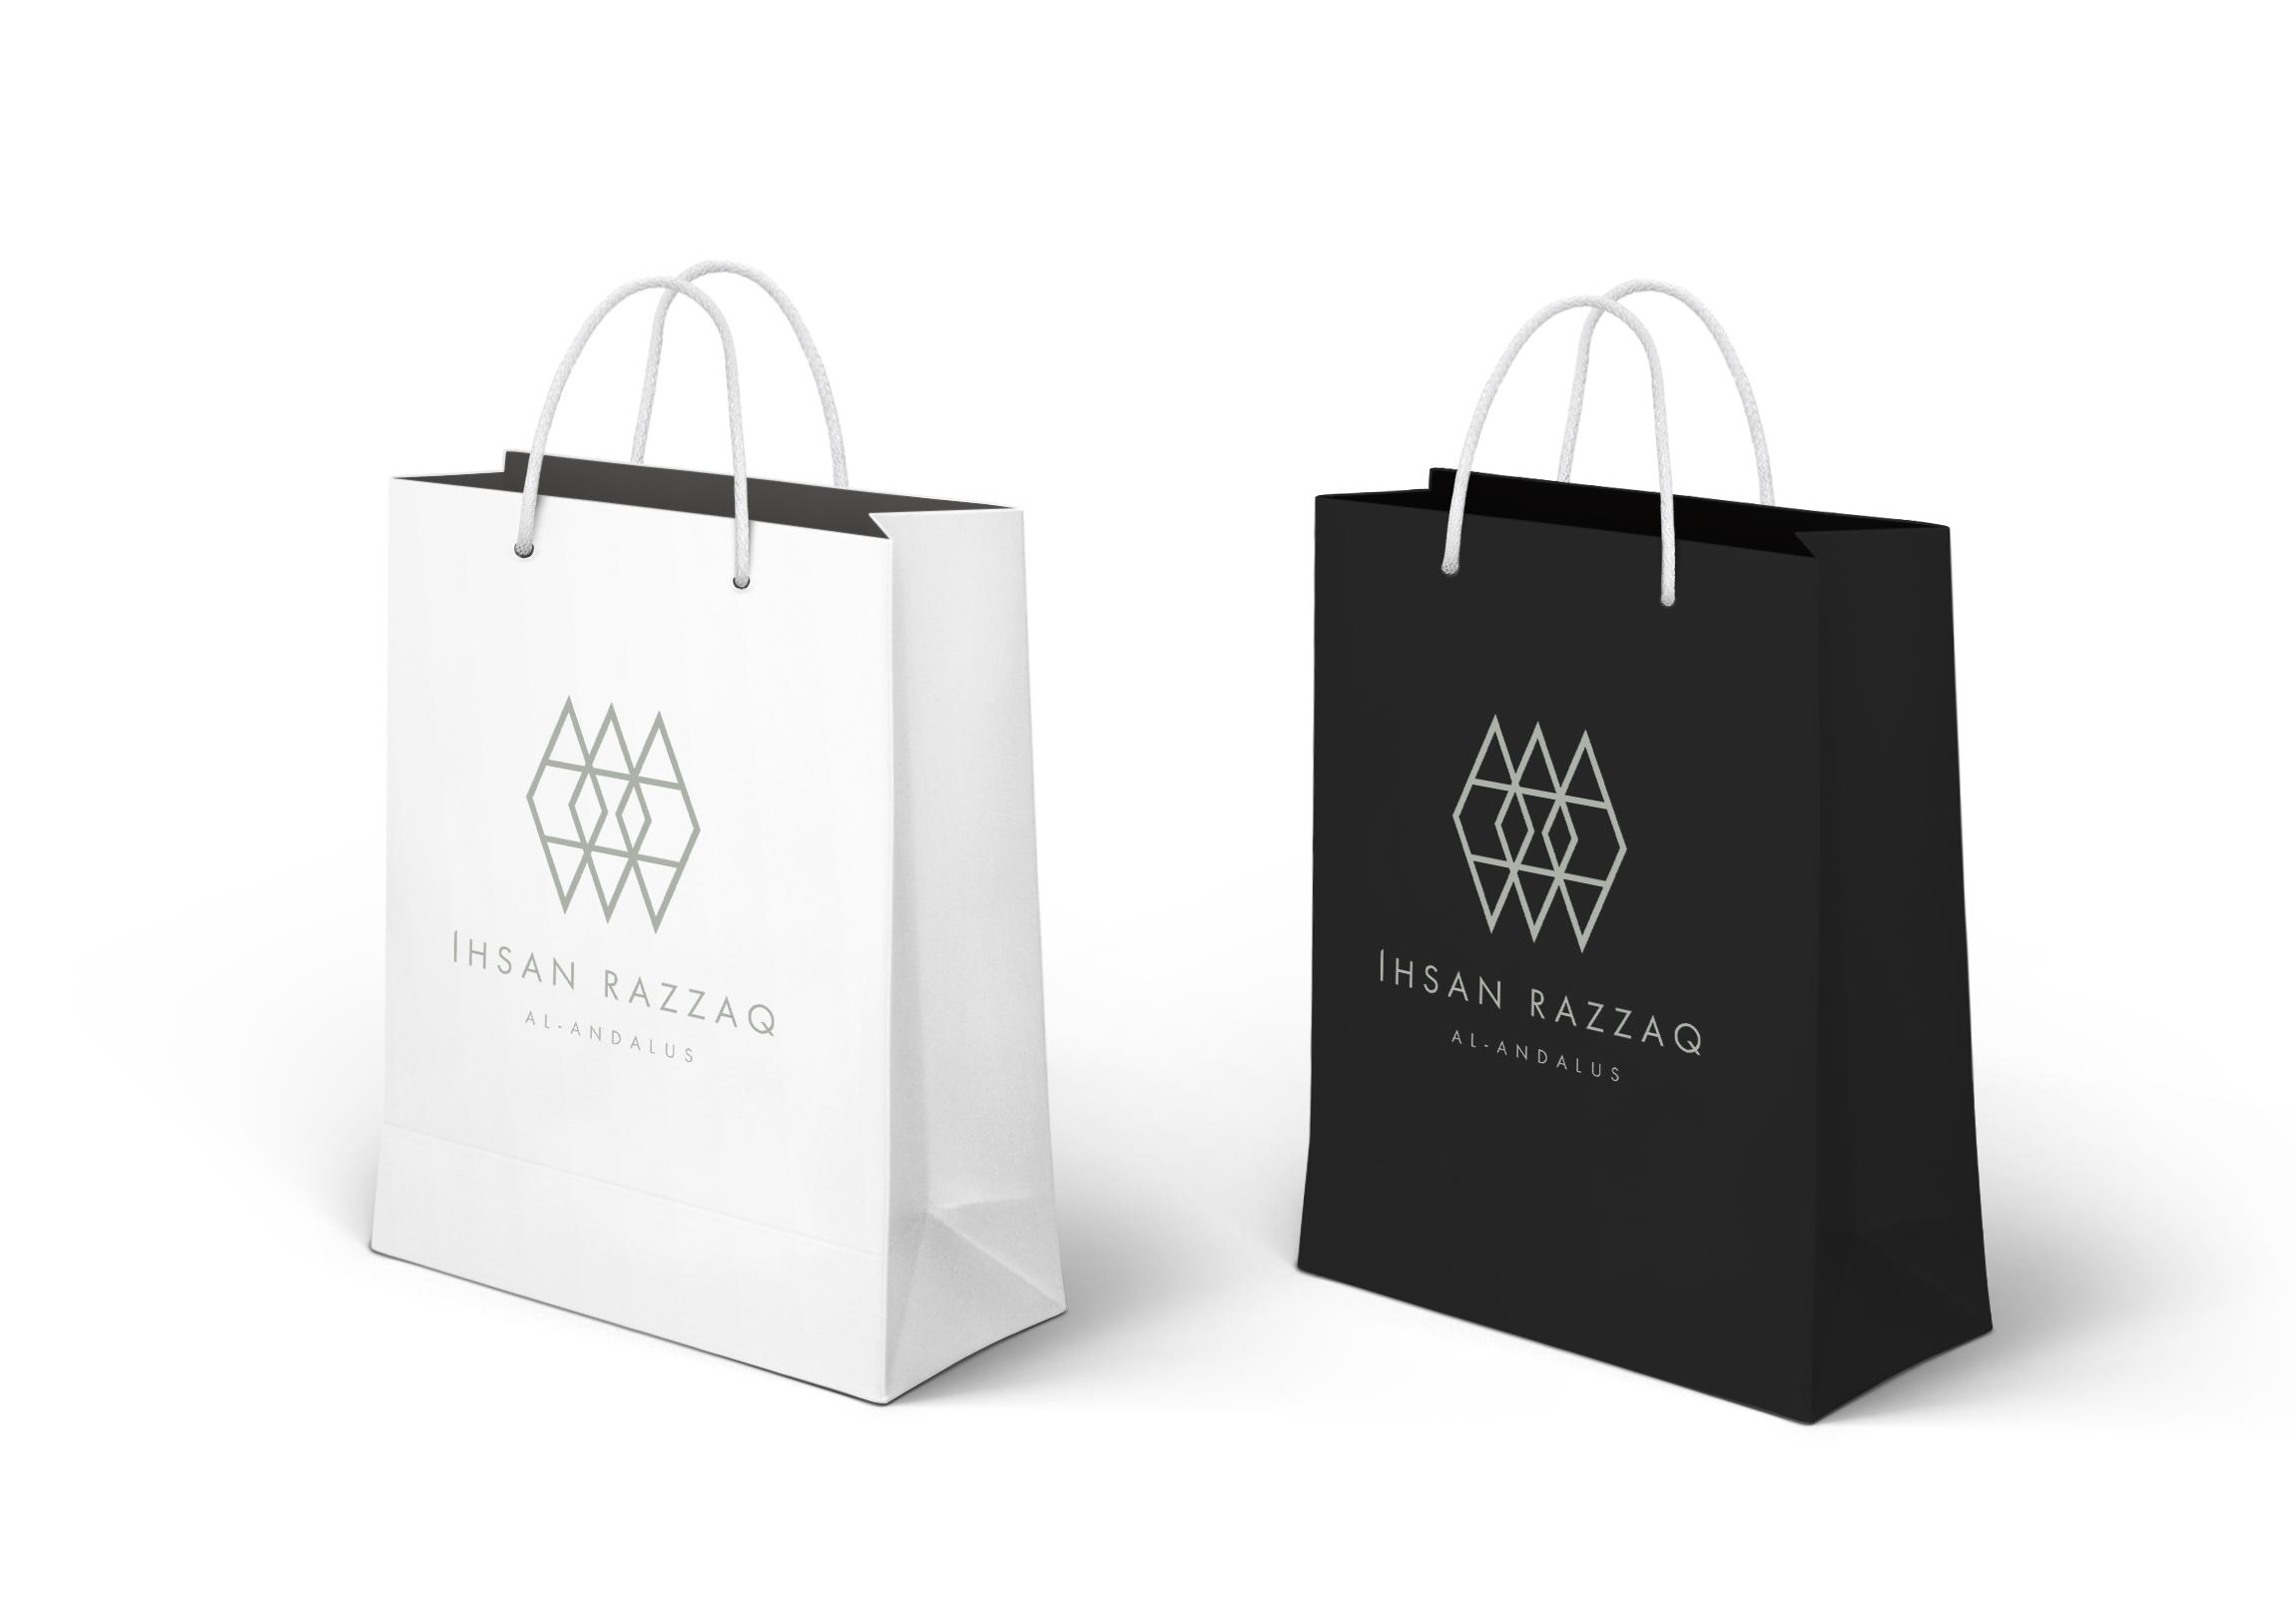 Branding y diseño web para Ihsan Razzaq por Binarid